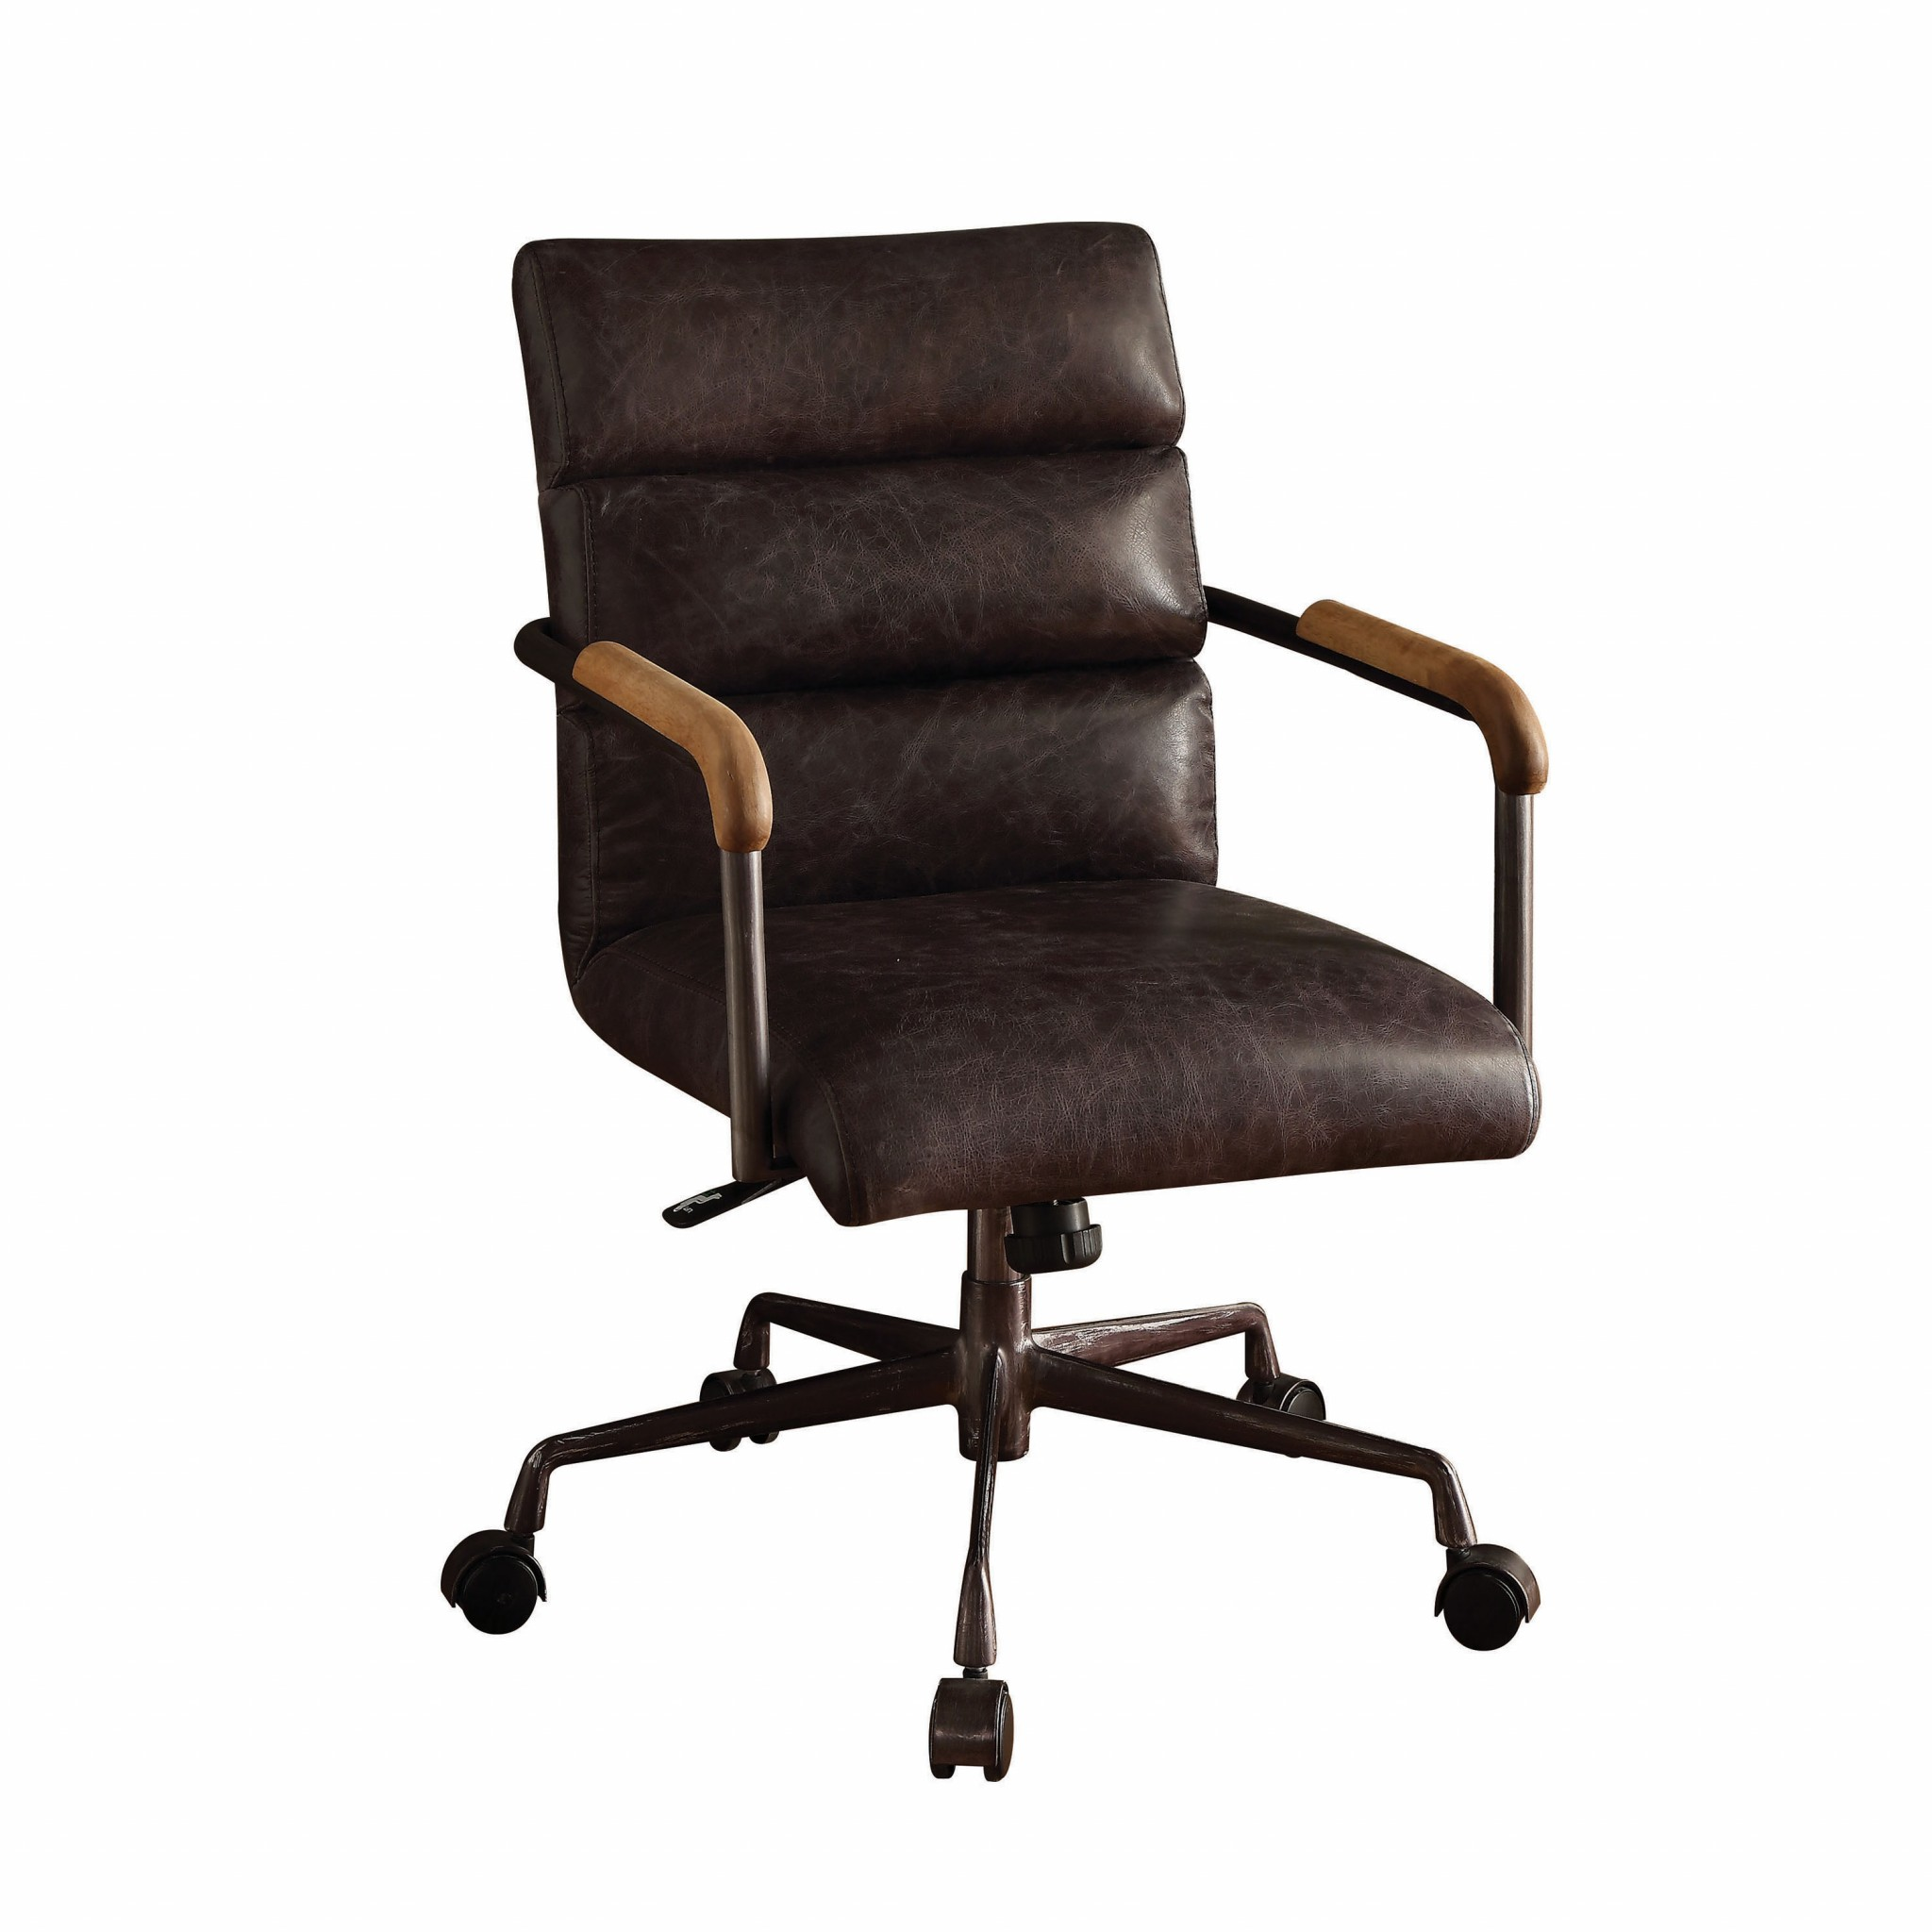 "22"" X 26"" X 35-38"" Antique Ebony Top Grain Leather Office Chair"